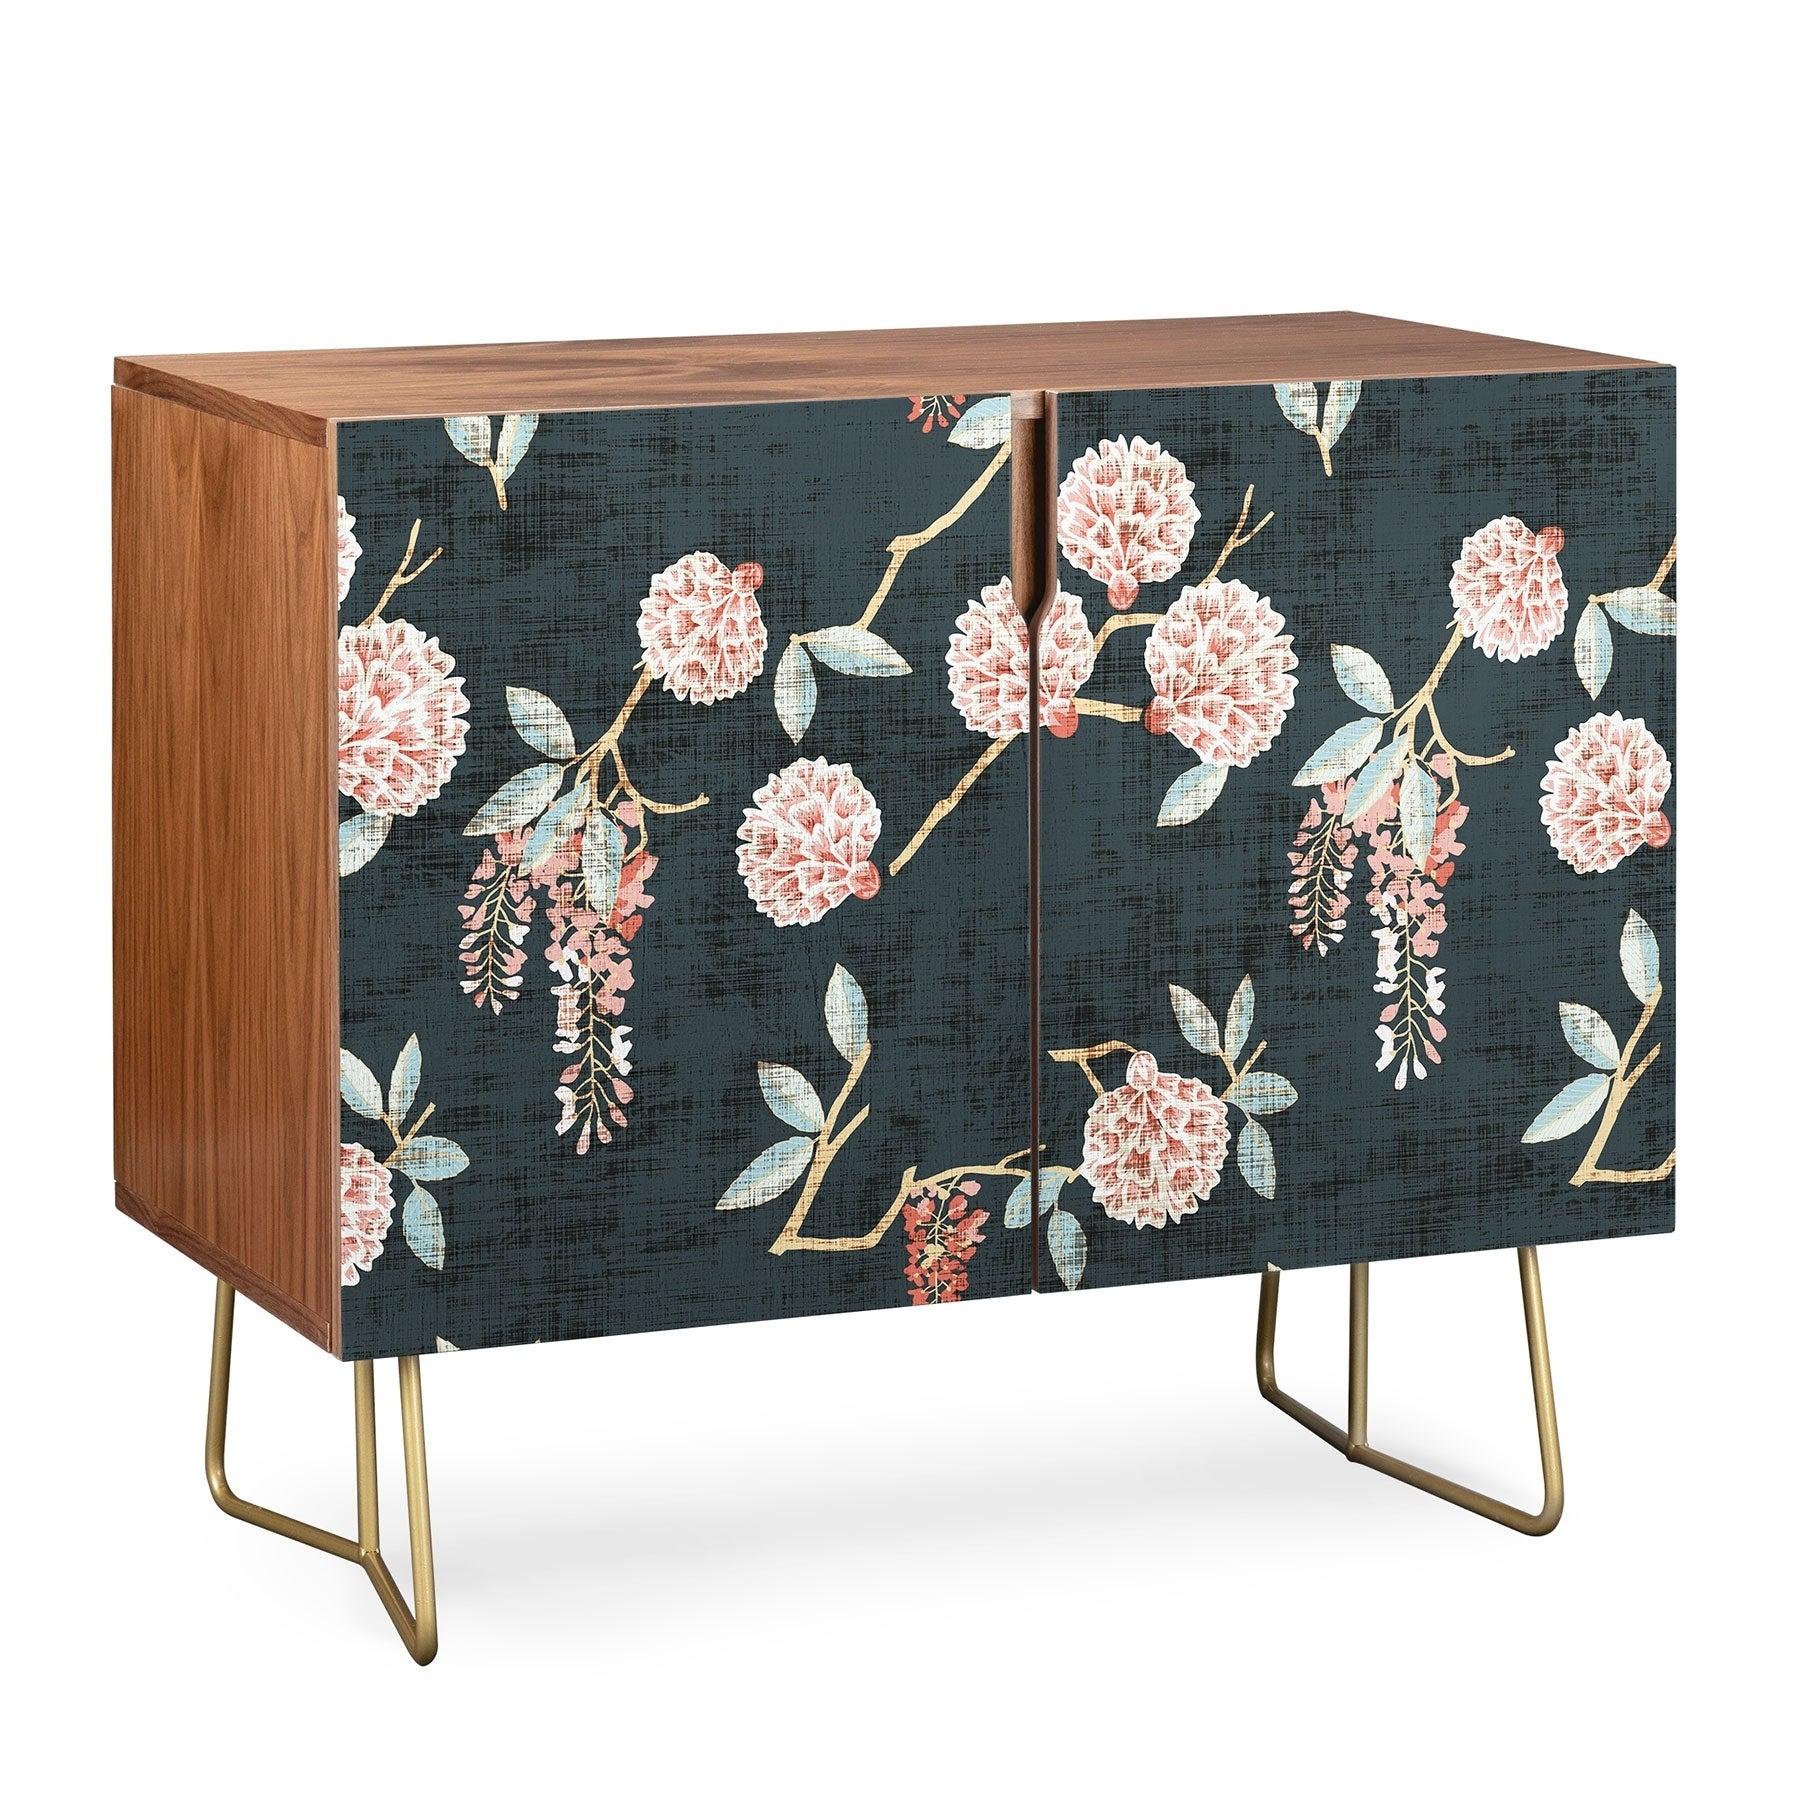 Deny Designs Floralista Credenza (Birch Or Walnut, 2 Leg Options) Within Oenomel Credenzas (Gallery 19 of 30)